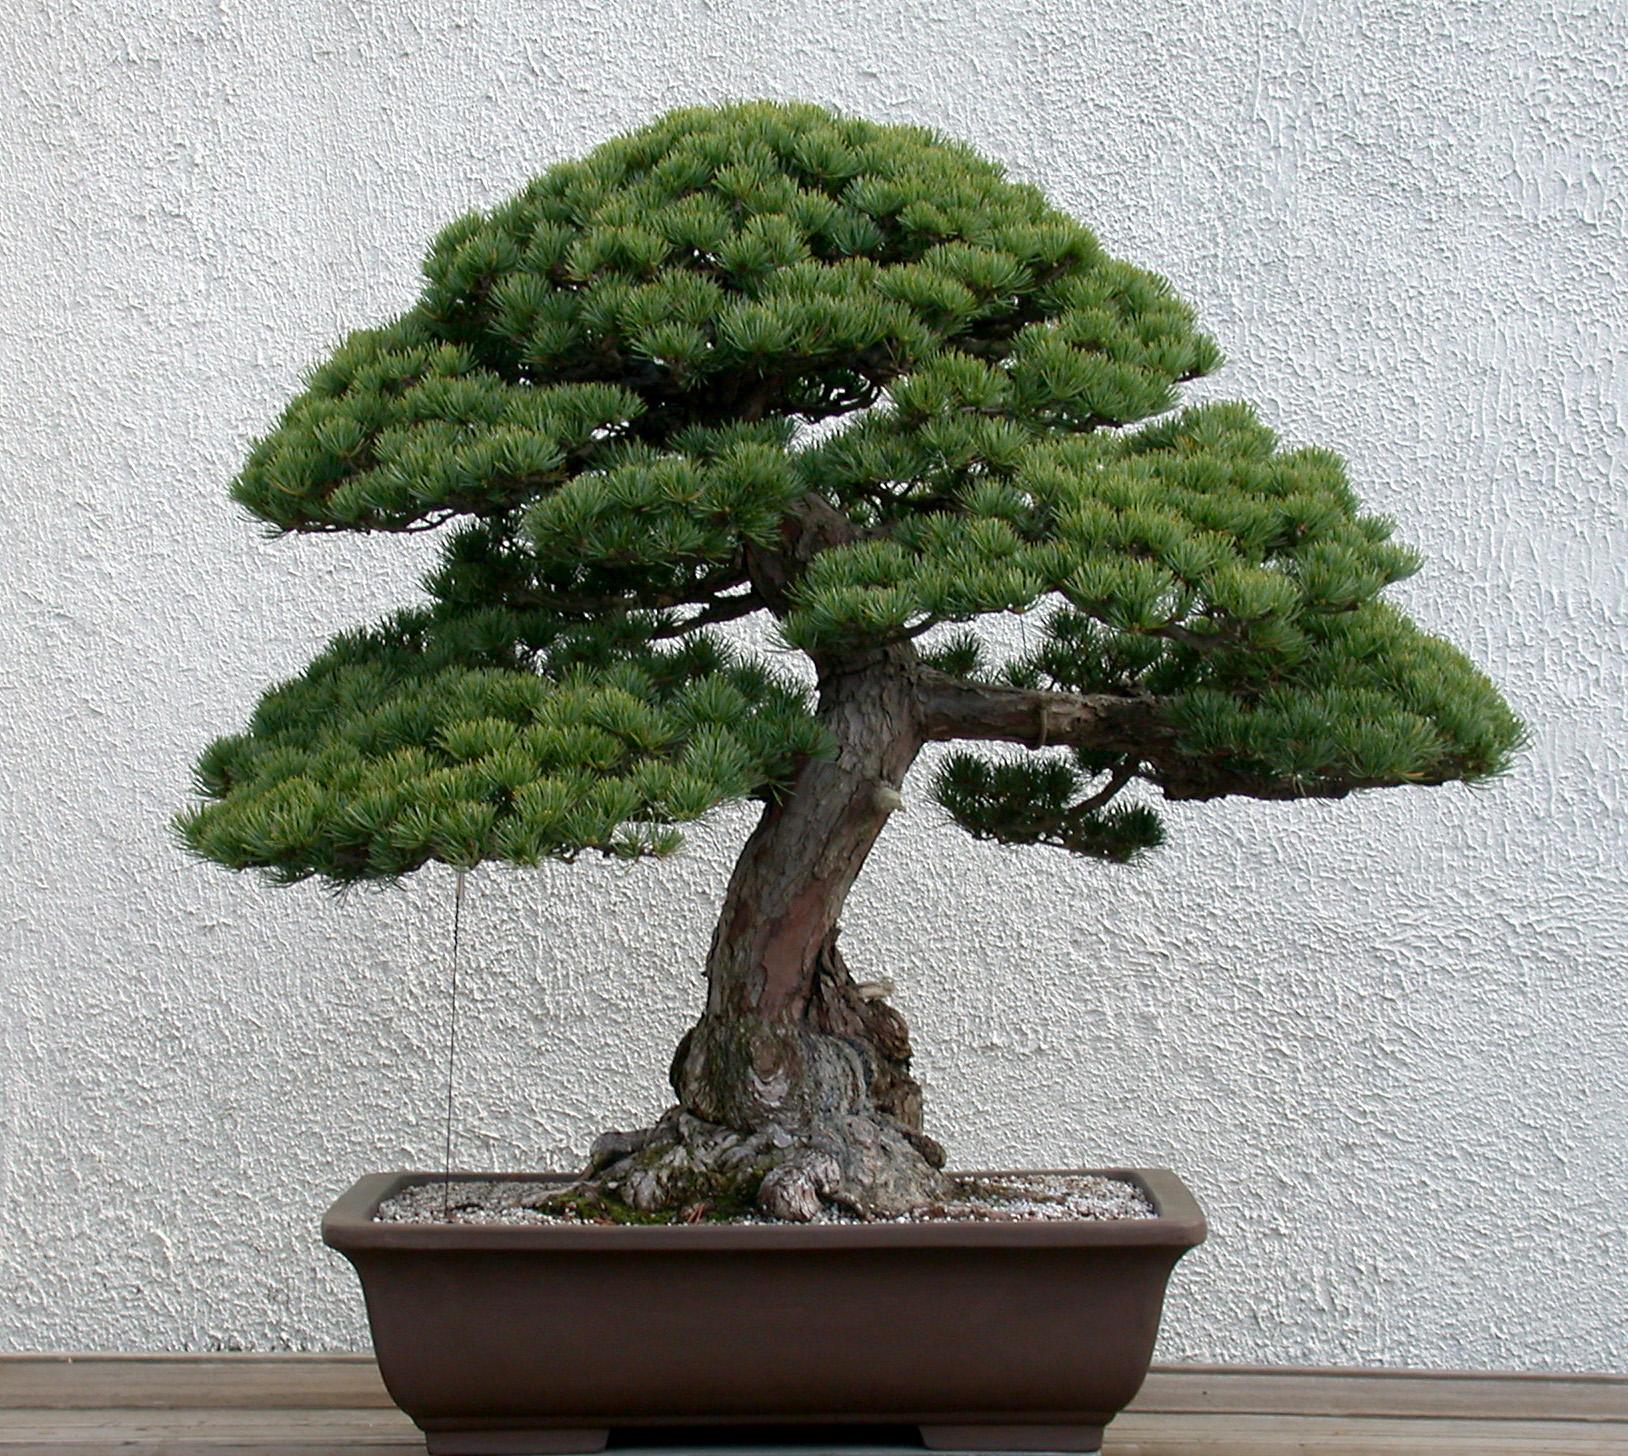 Japanese white pine